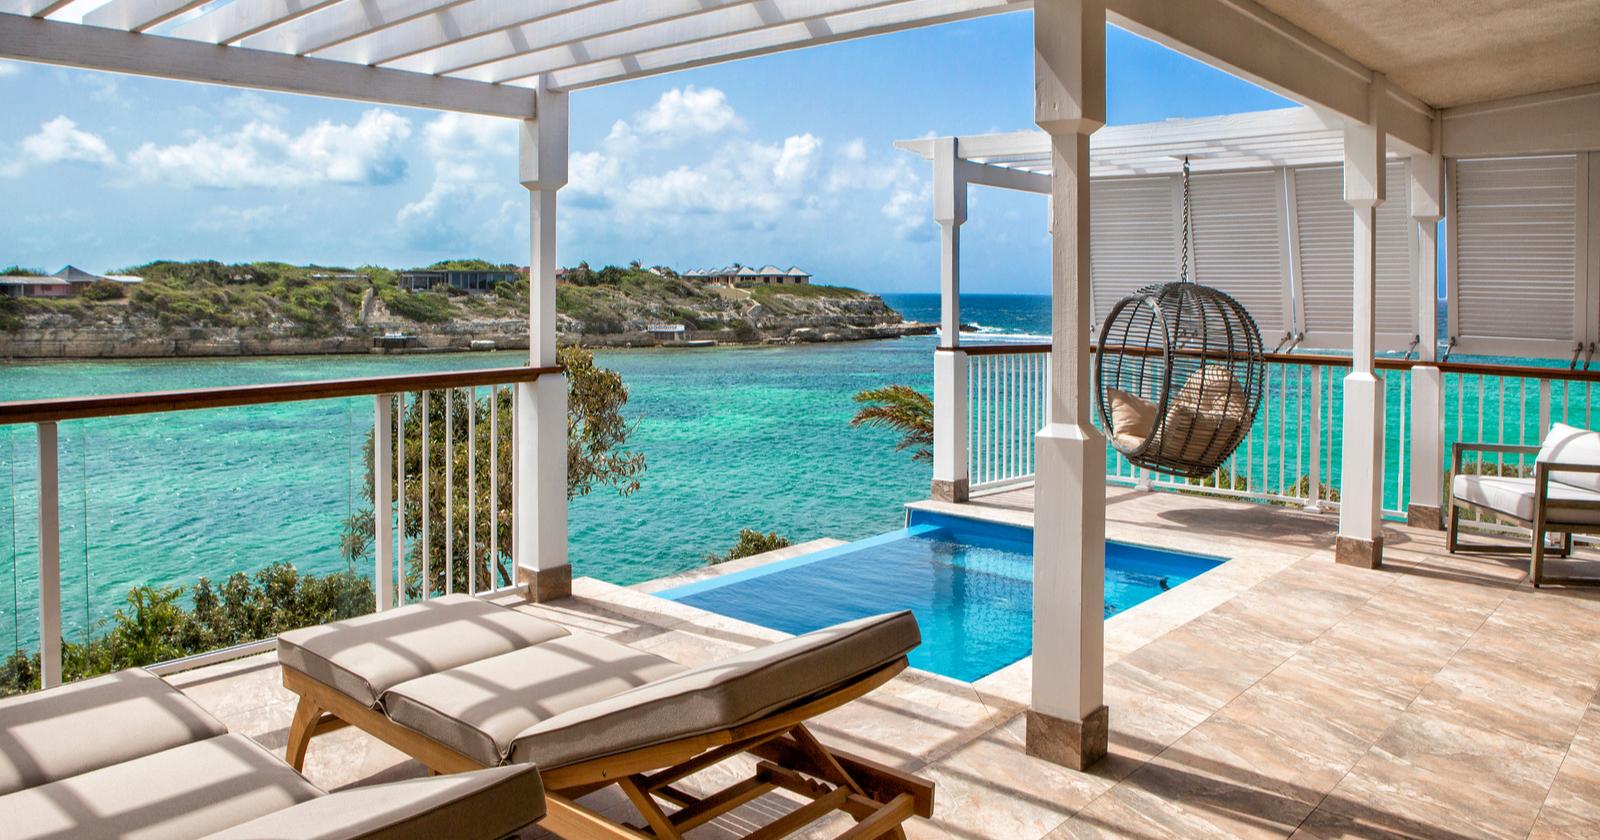 hammock cove infinity pool balcony with beach and sea view